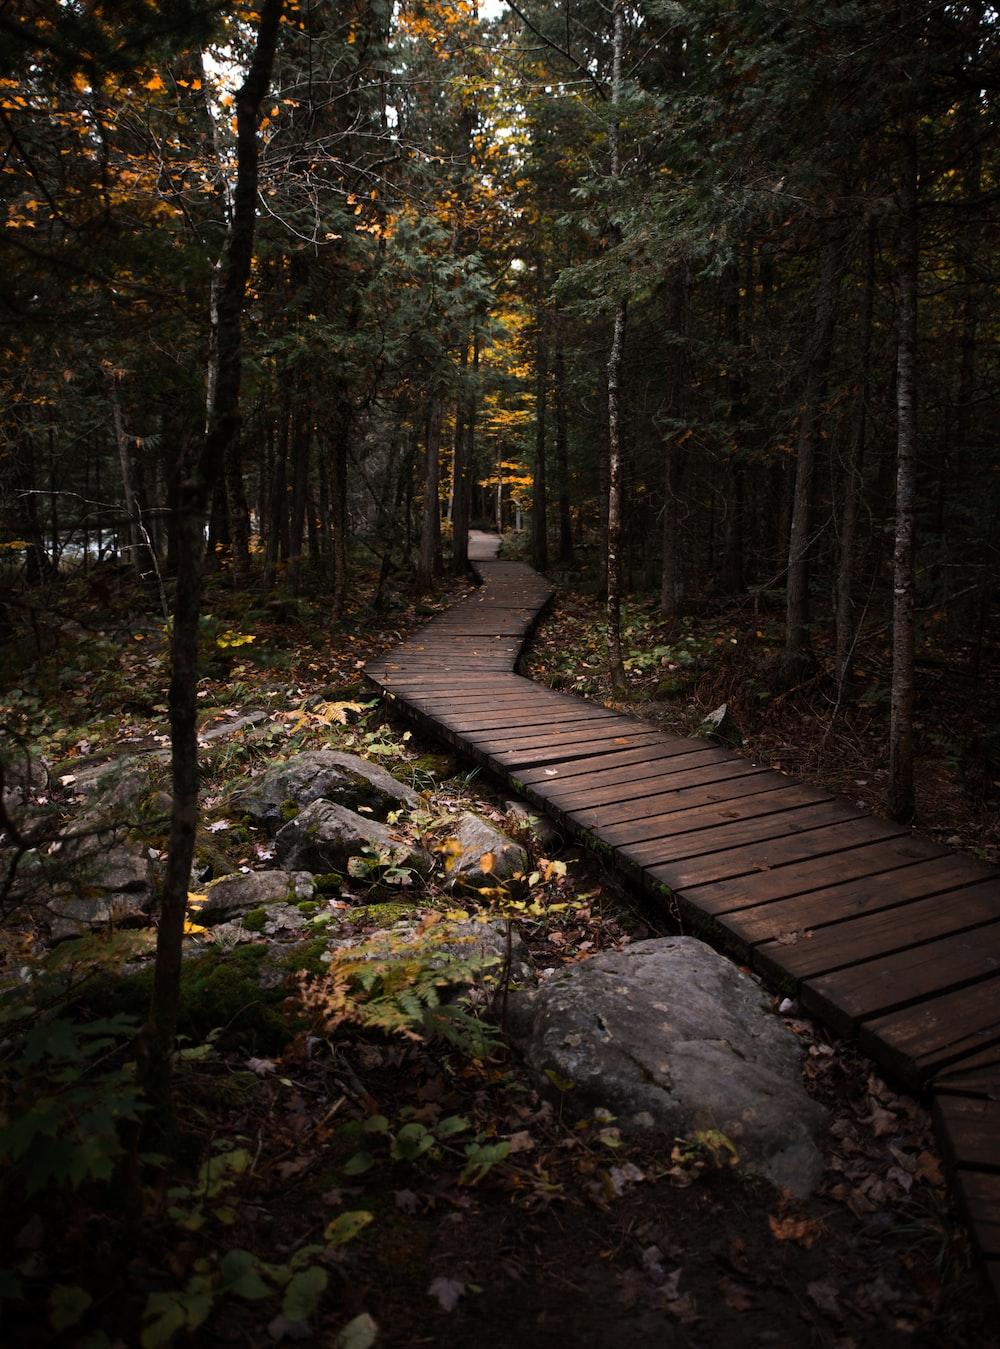 empty pathway through the woods